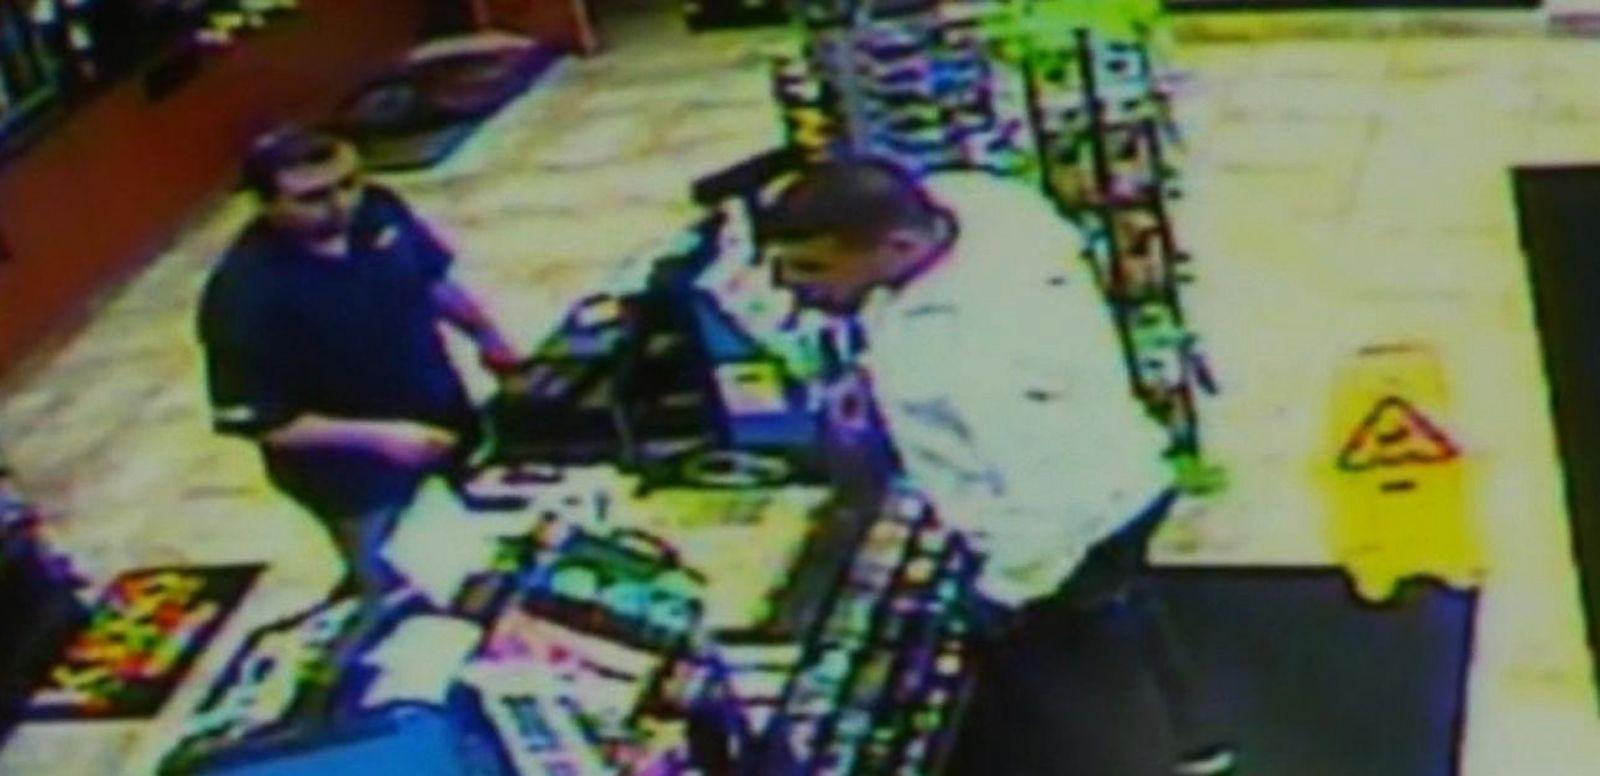 Aaron Hernandez Murder Trial: Explosive New Evidence